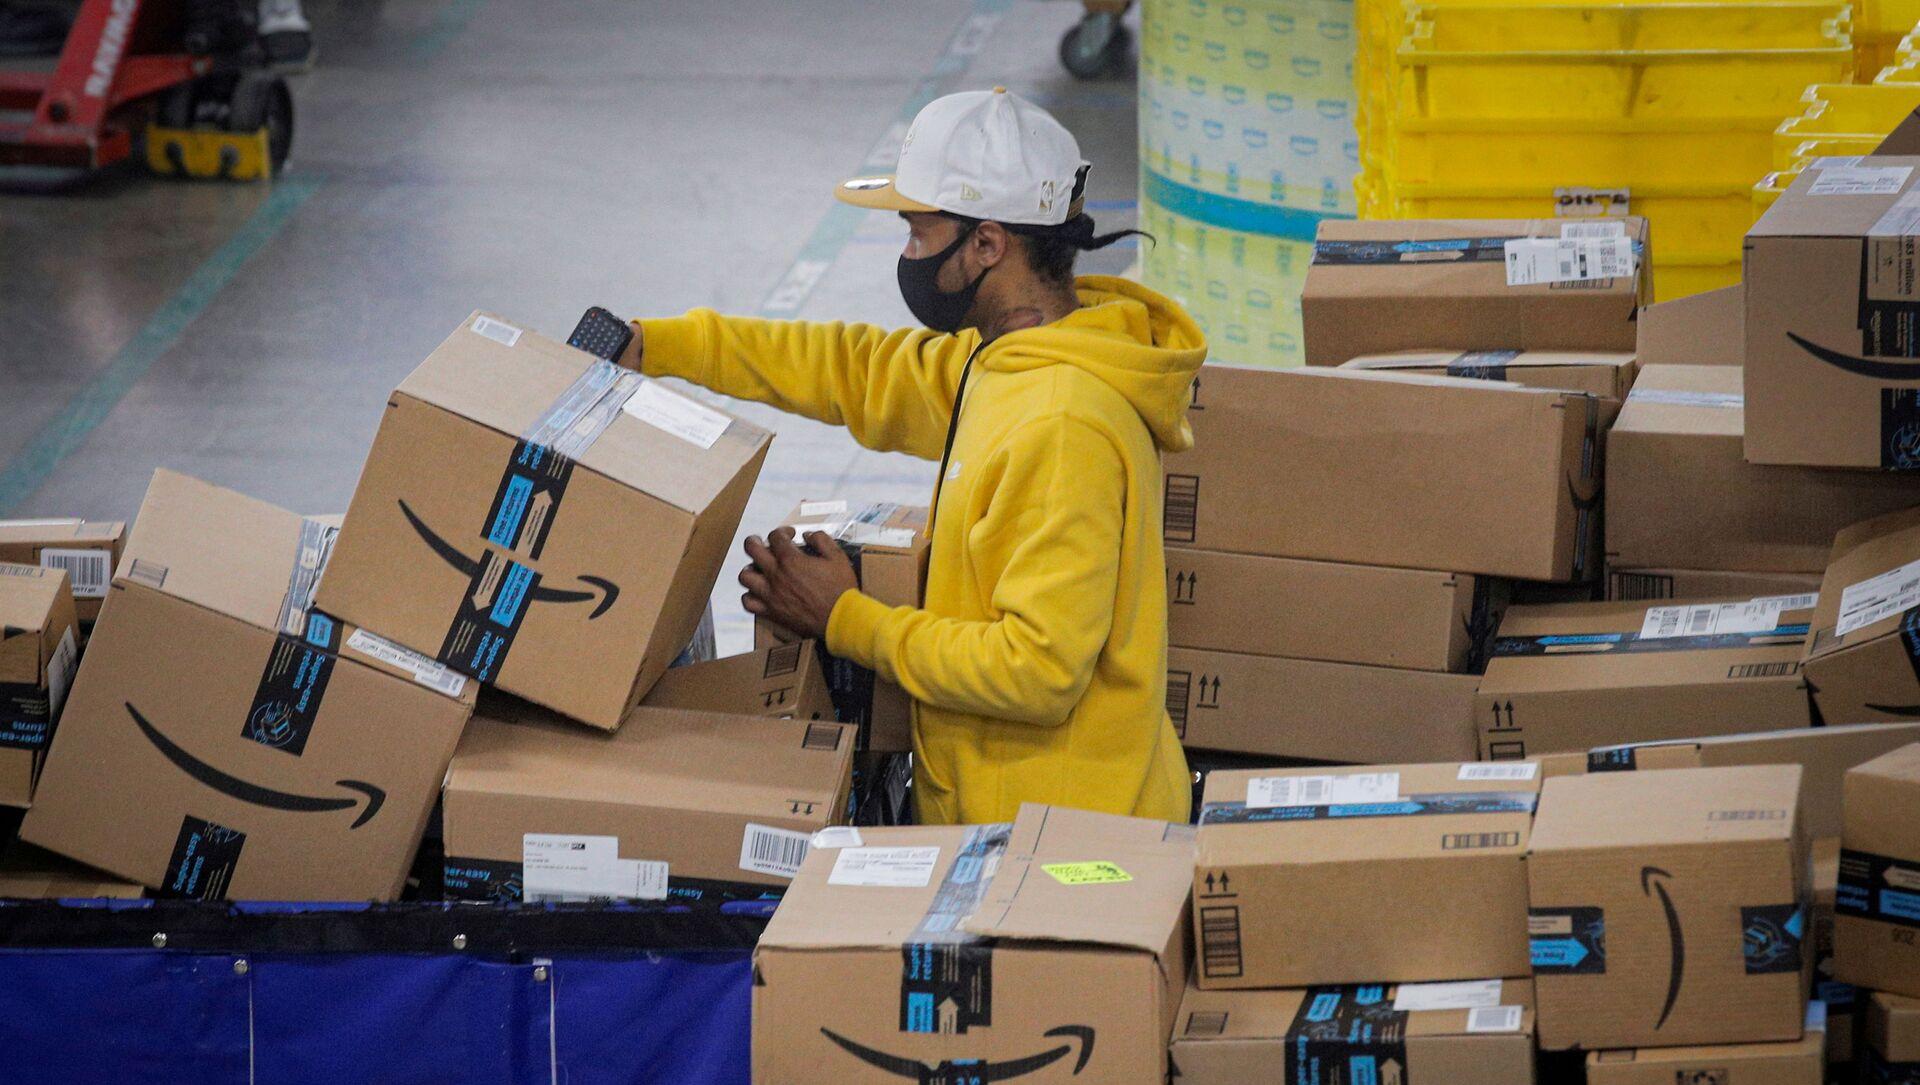 FILE PHOTO: An employee scans packages at Amazon's JFK8 distribution center in Staten Island, New York, U.S. November 25, 2020.  - Sputnik International, 1920, 03.08.2021